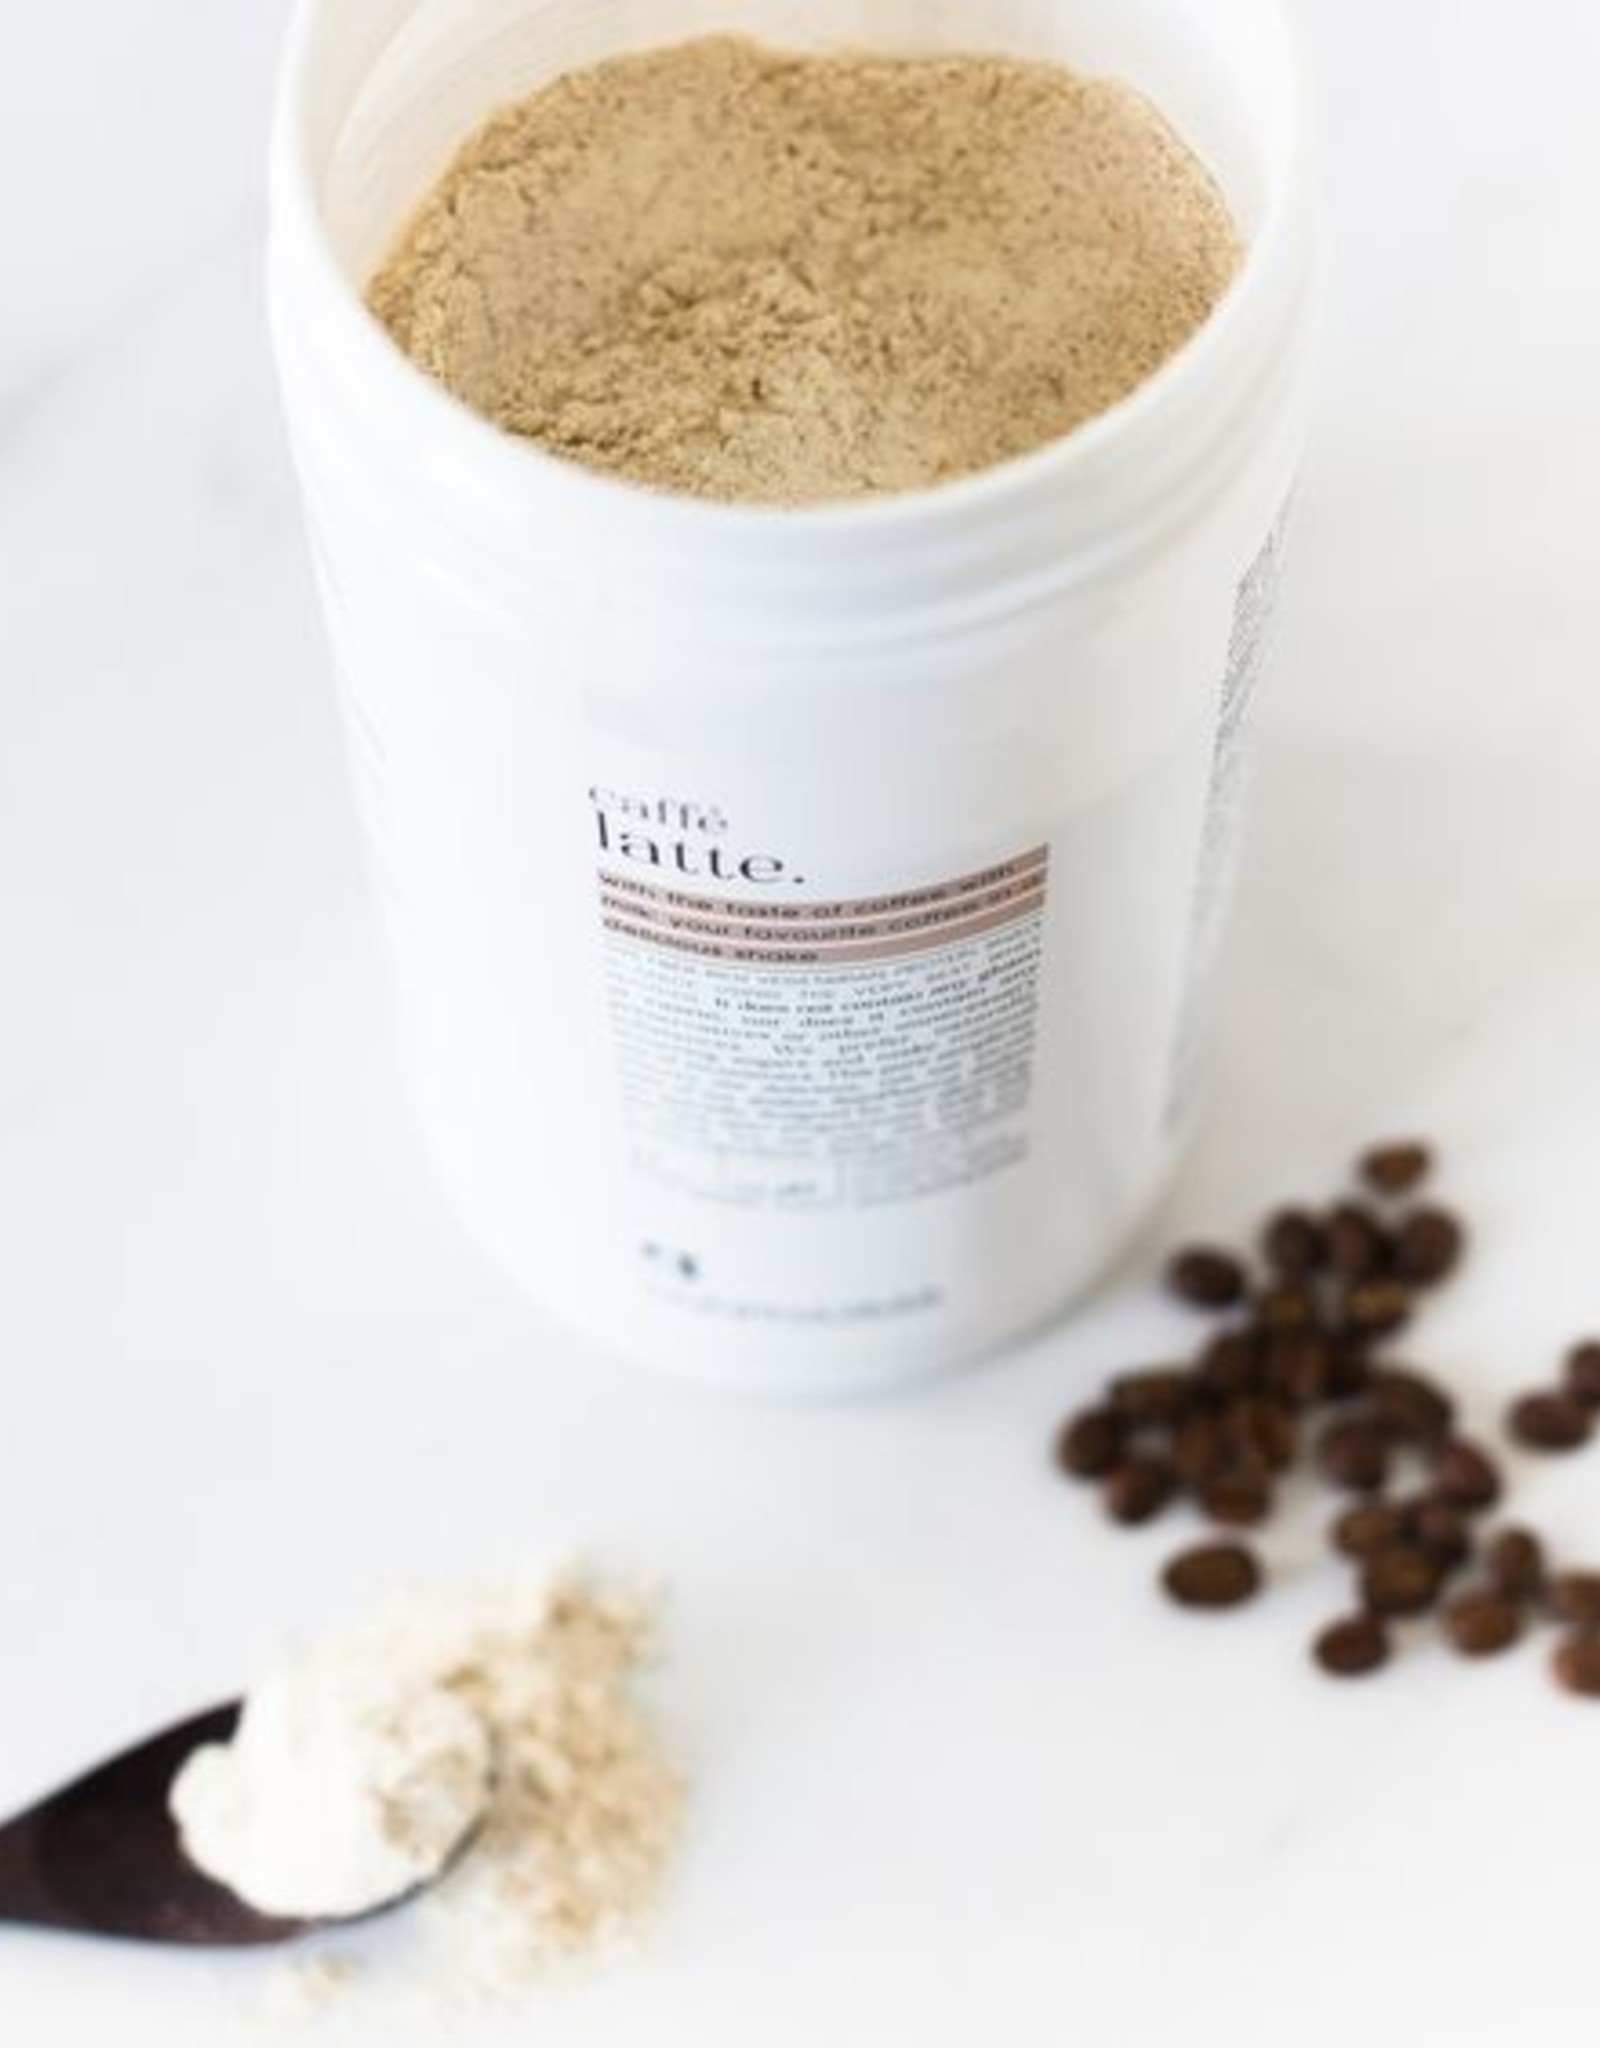 RainPharma Rainpharma - Caffe Latte